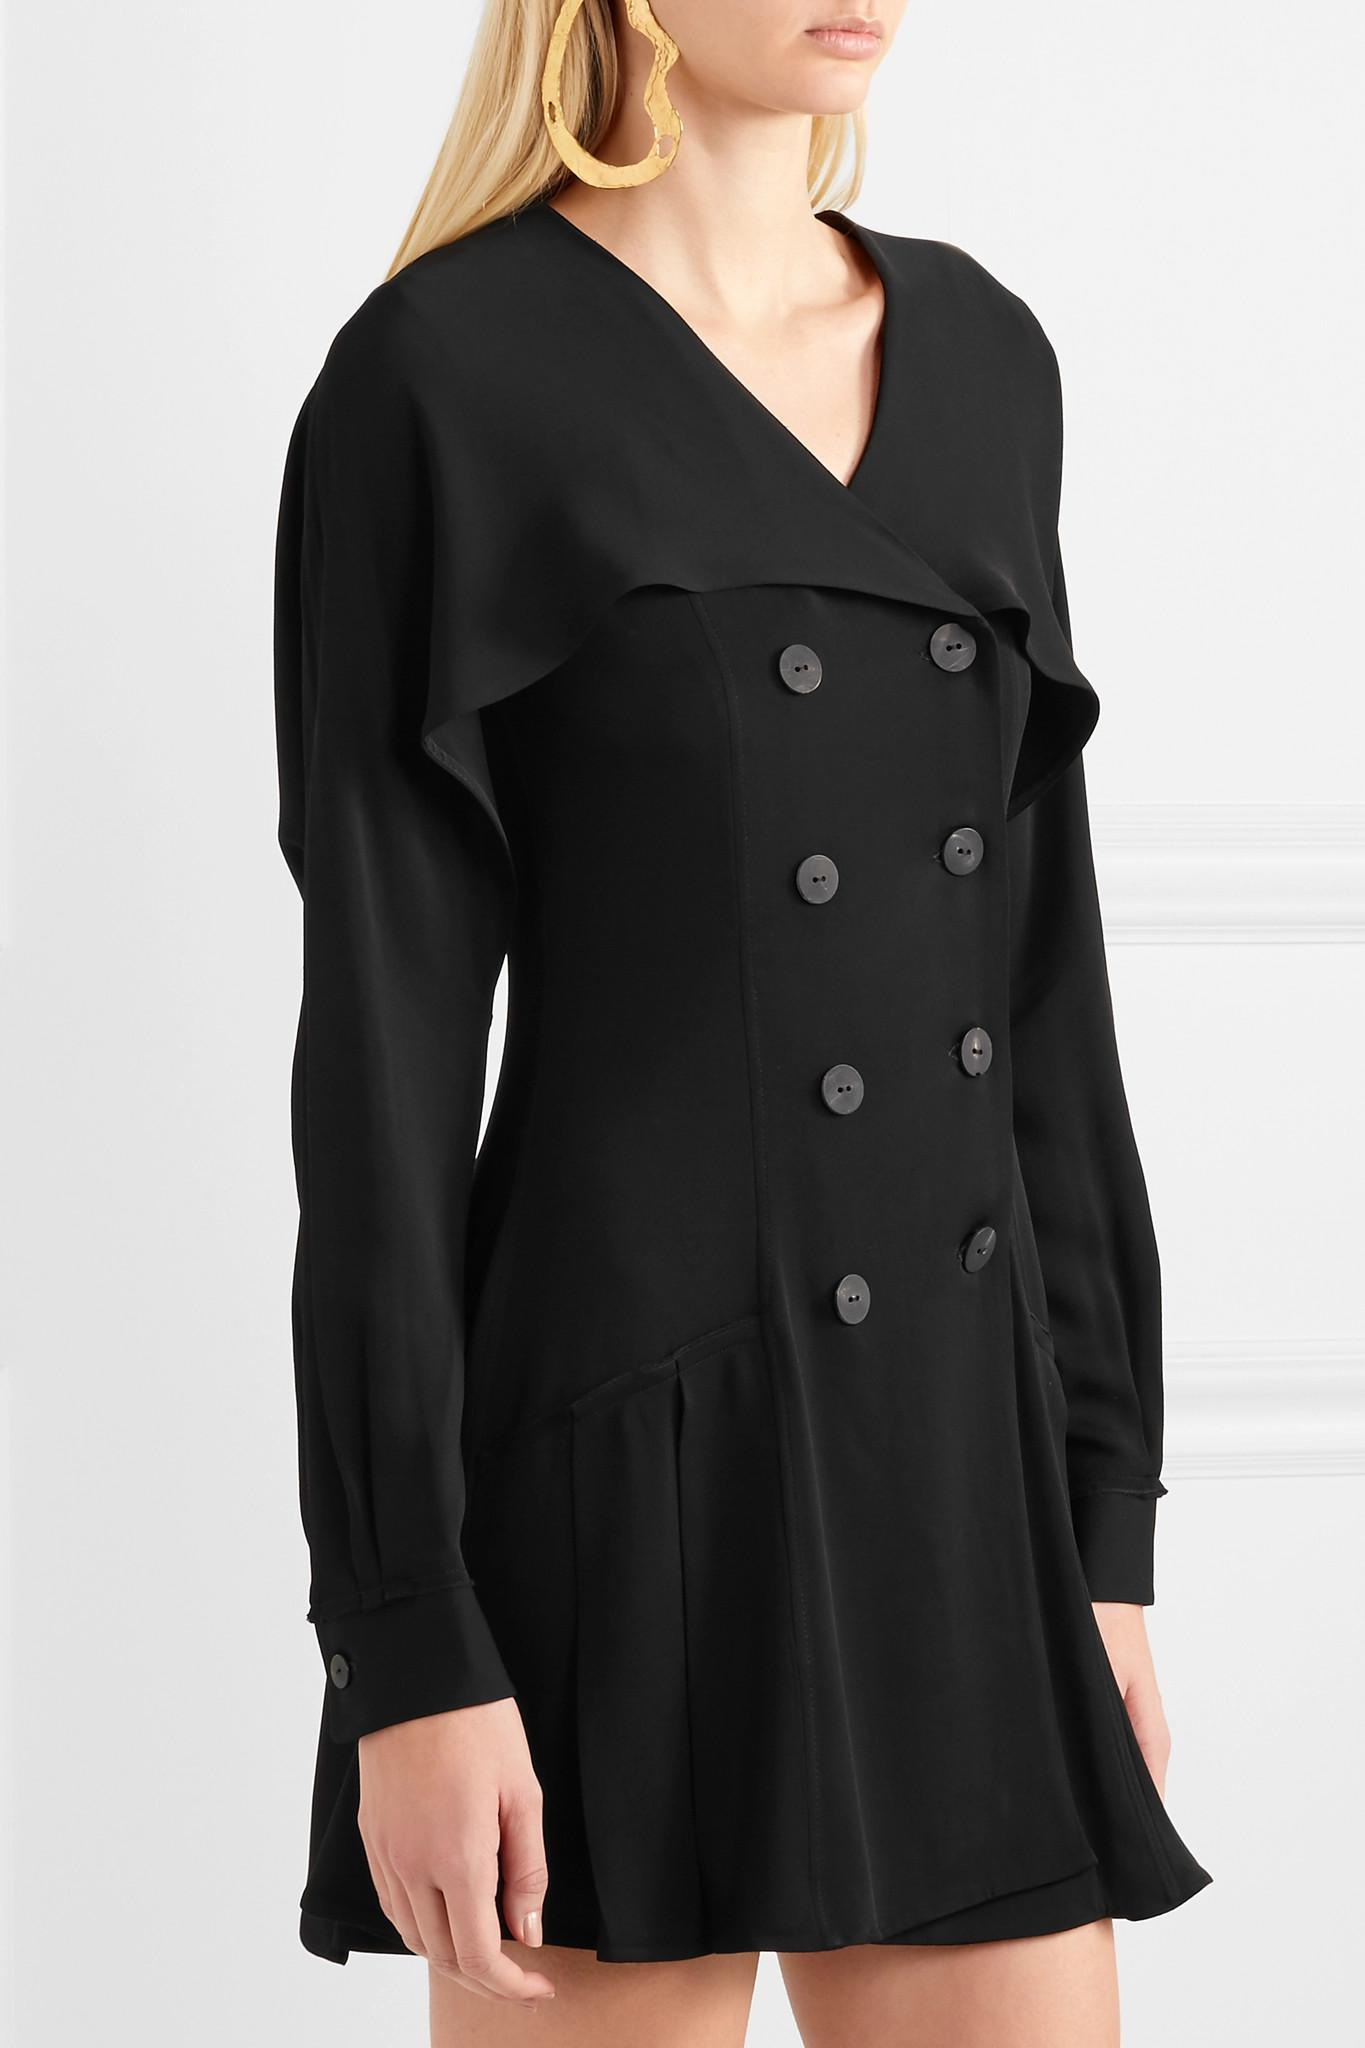 Crepe Mini Dress - Black J.W.Anderson WKXY6fNvnX